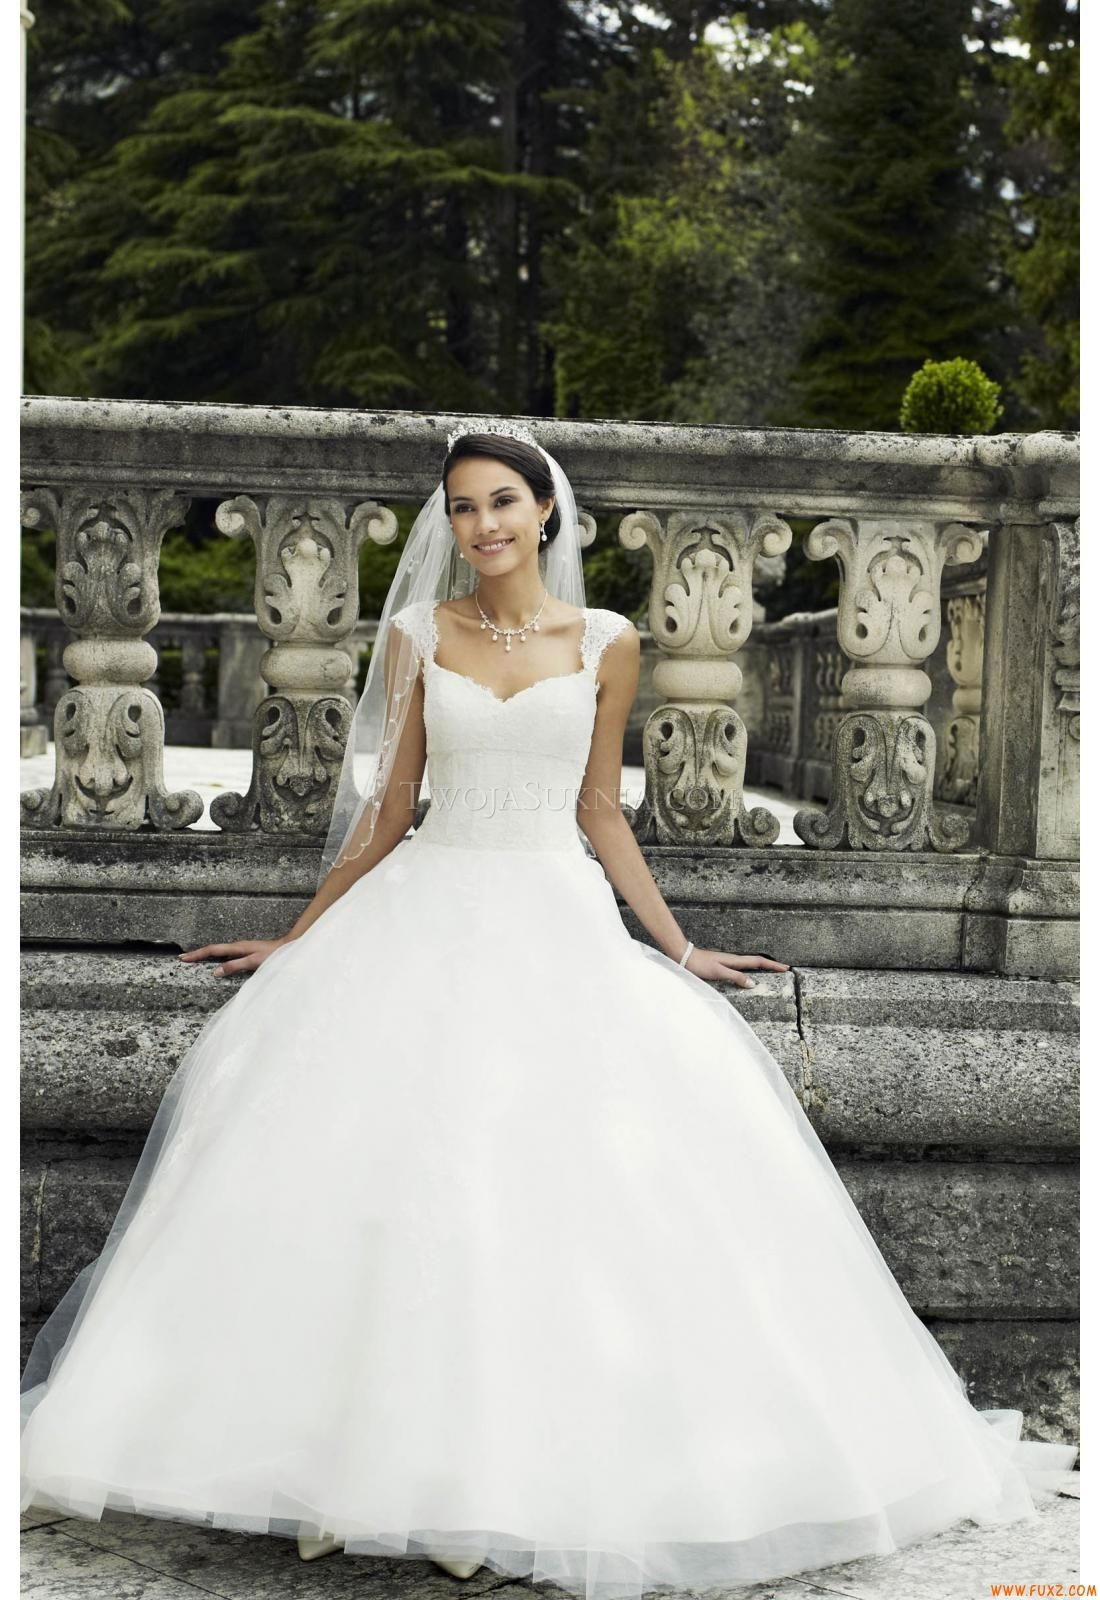 Wedding dresses lilly cr lilly short wedding dresses